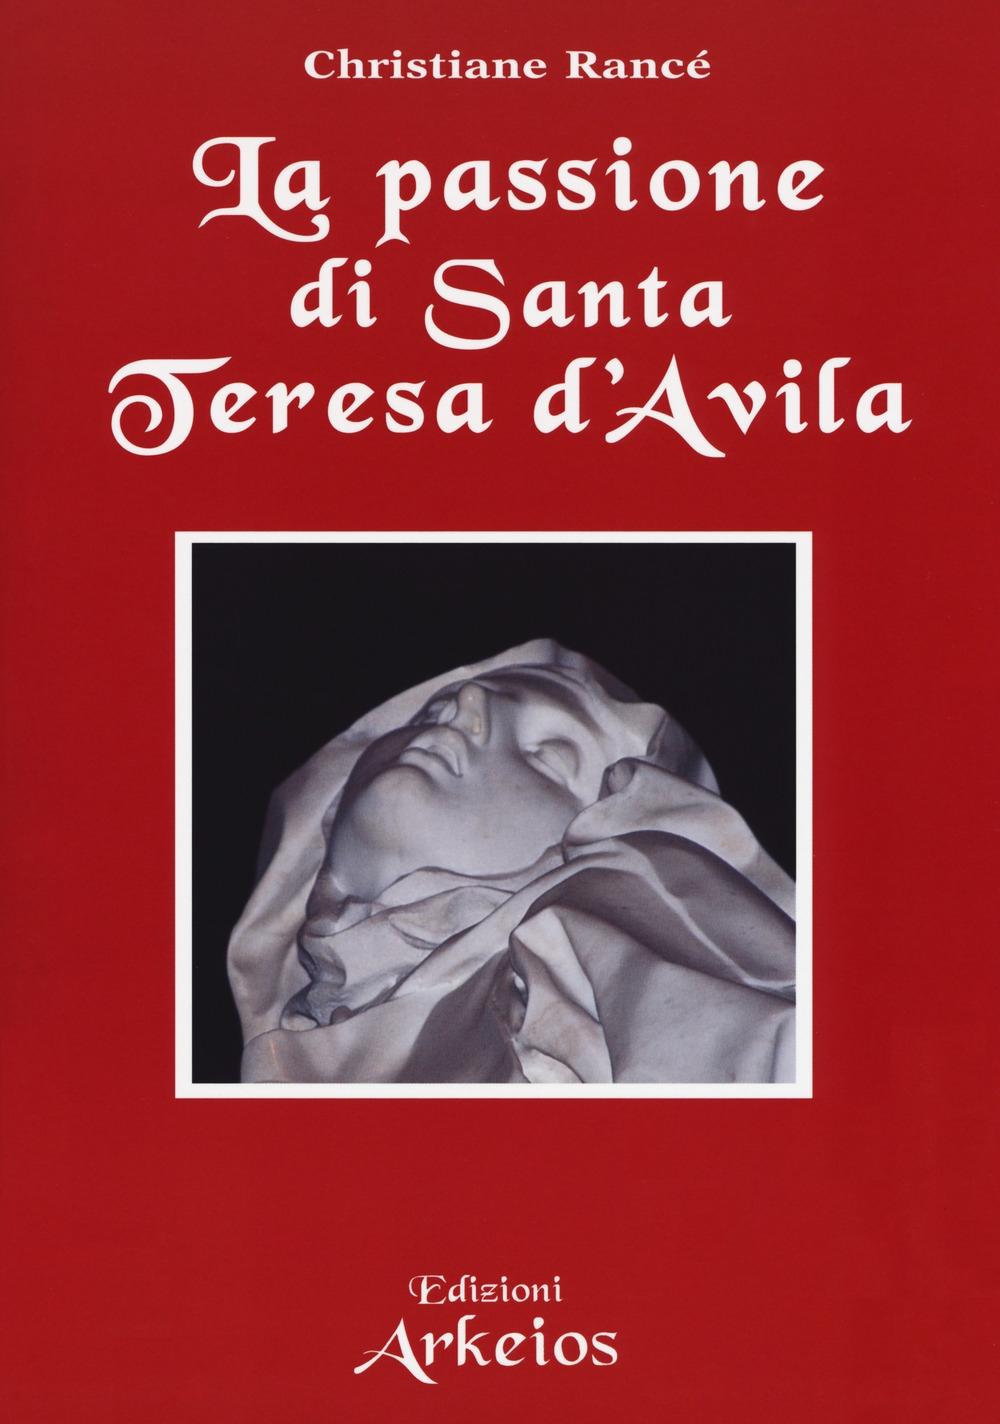 La passione di Teresa d'Avila